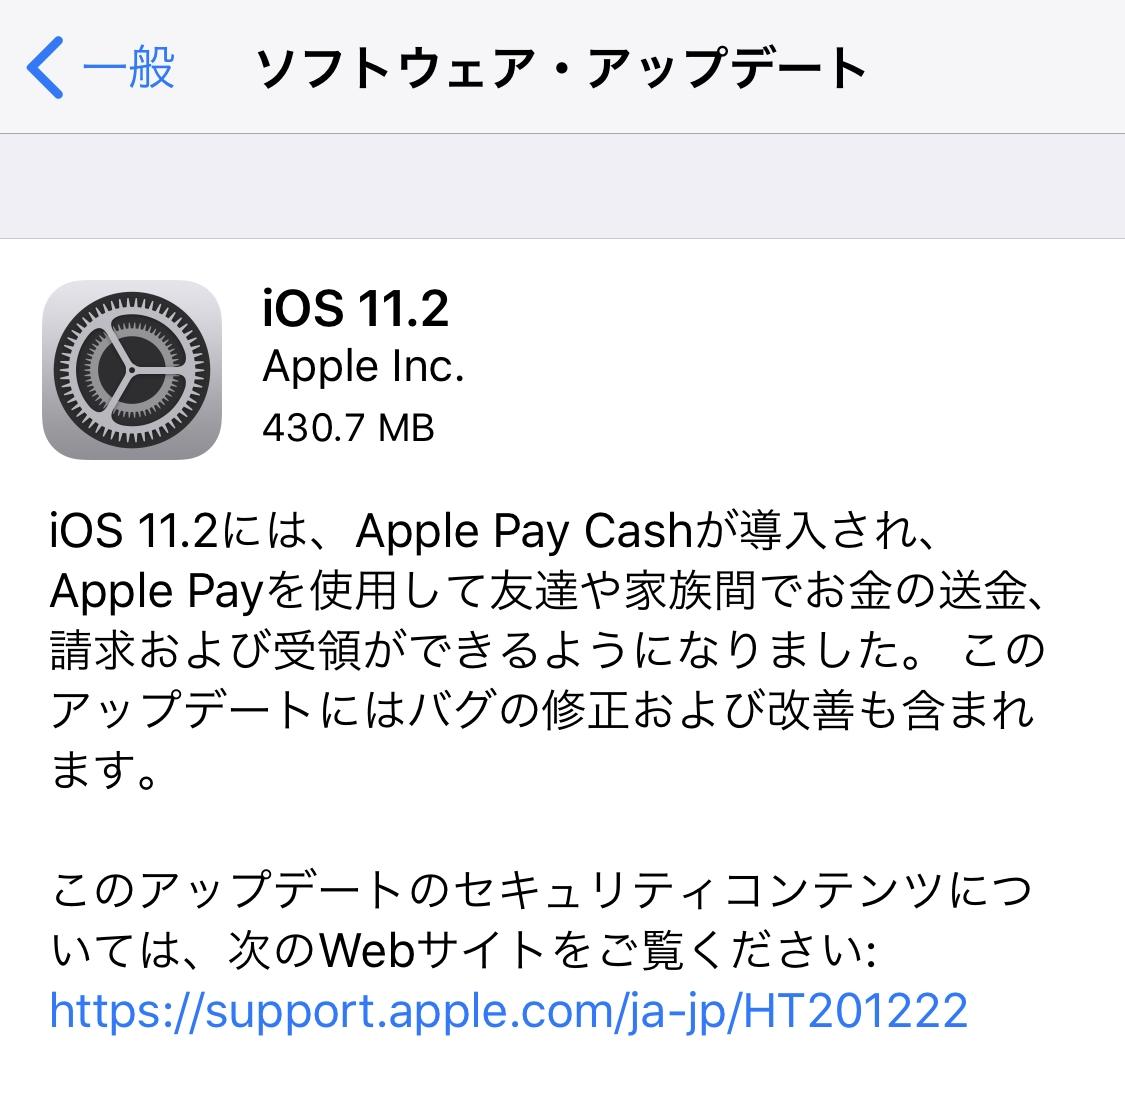 iOS11.2の不具合・評判は?iPhone再起動障害の修正、ワイヤレス充電高速化、ApplePayCash対応等【Apple】格安SIMの対応状況もアリ